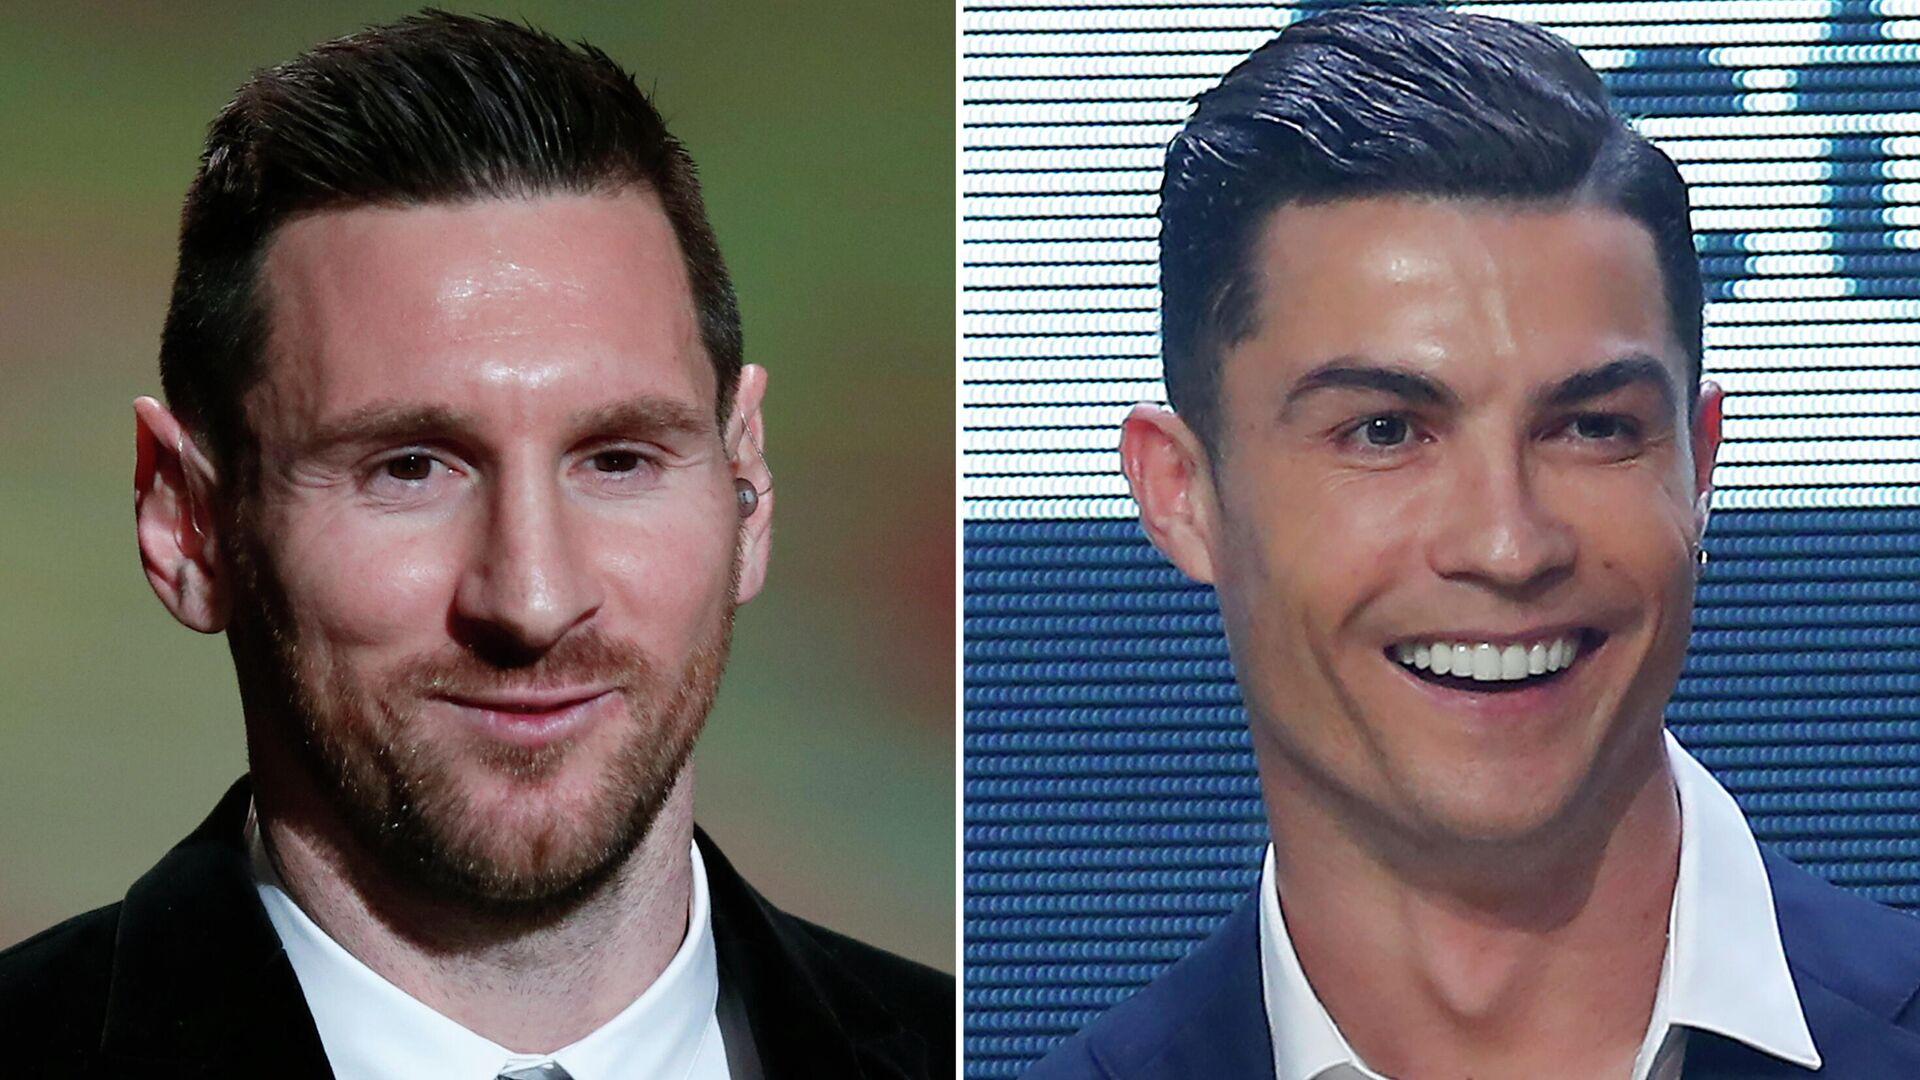 Lionel Messi y Cristiano Ronaldo, futbolistas - Sputnik Mundo, 1920, 08.09.2021